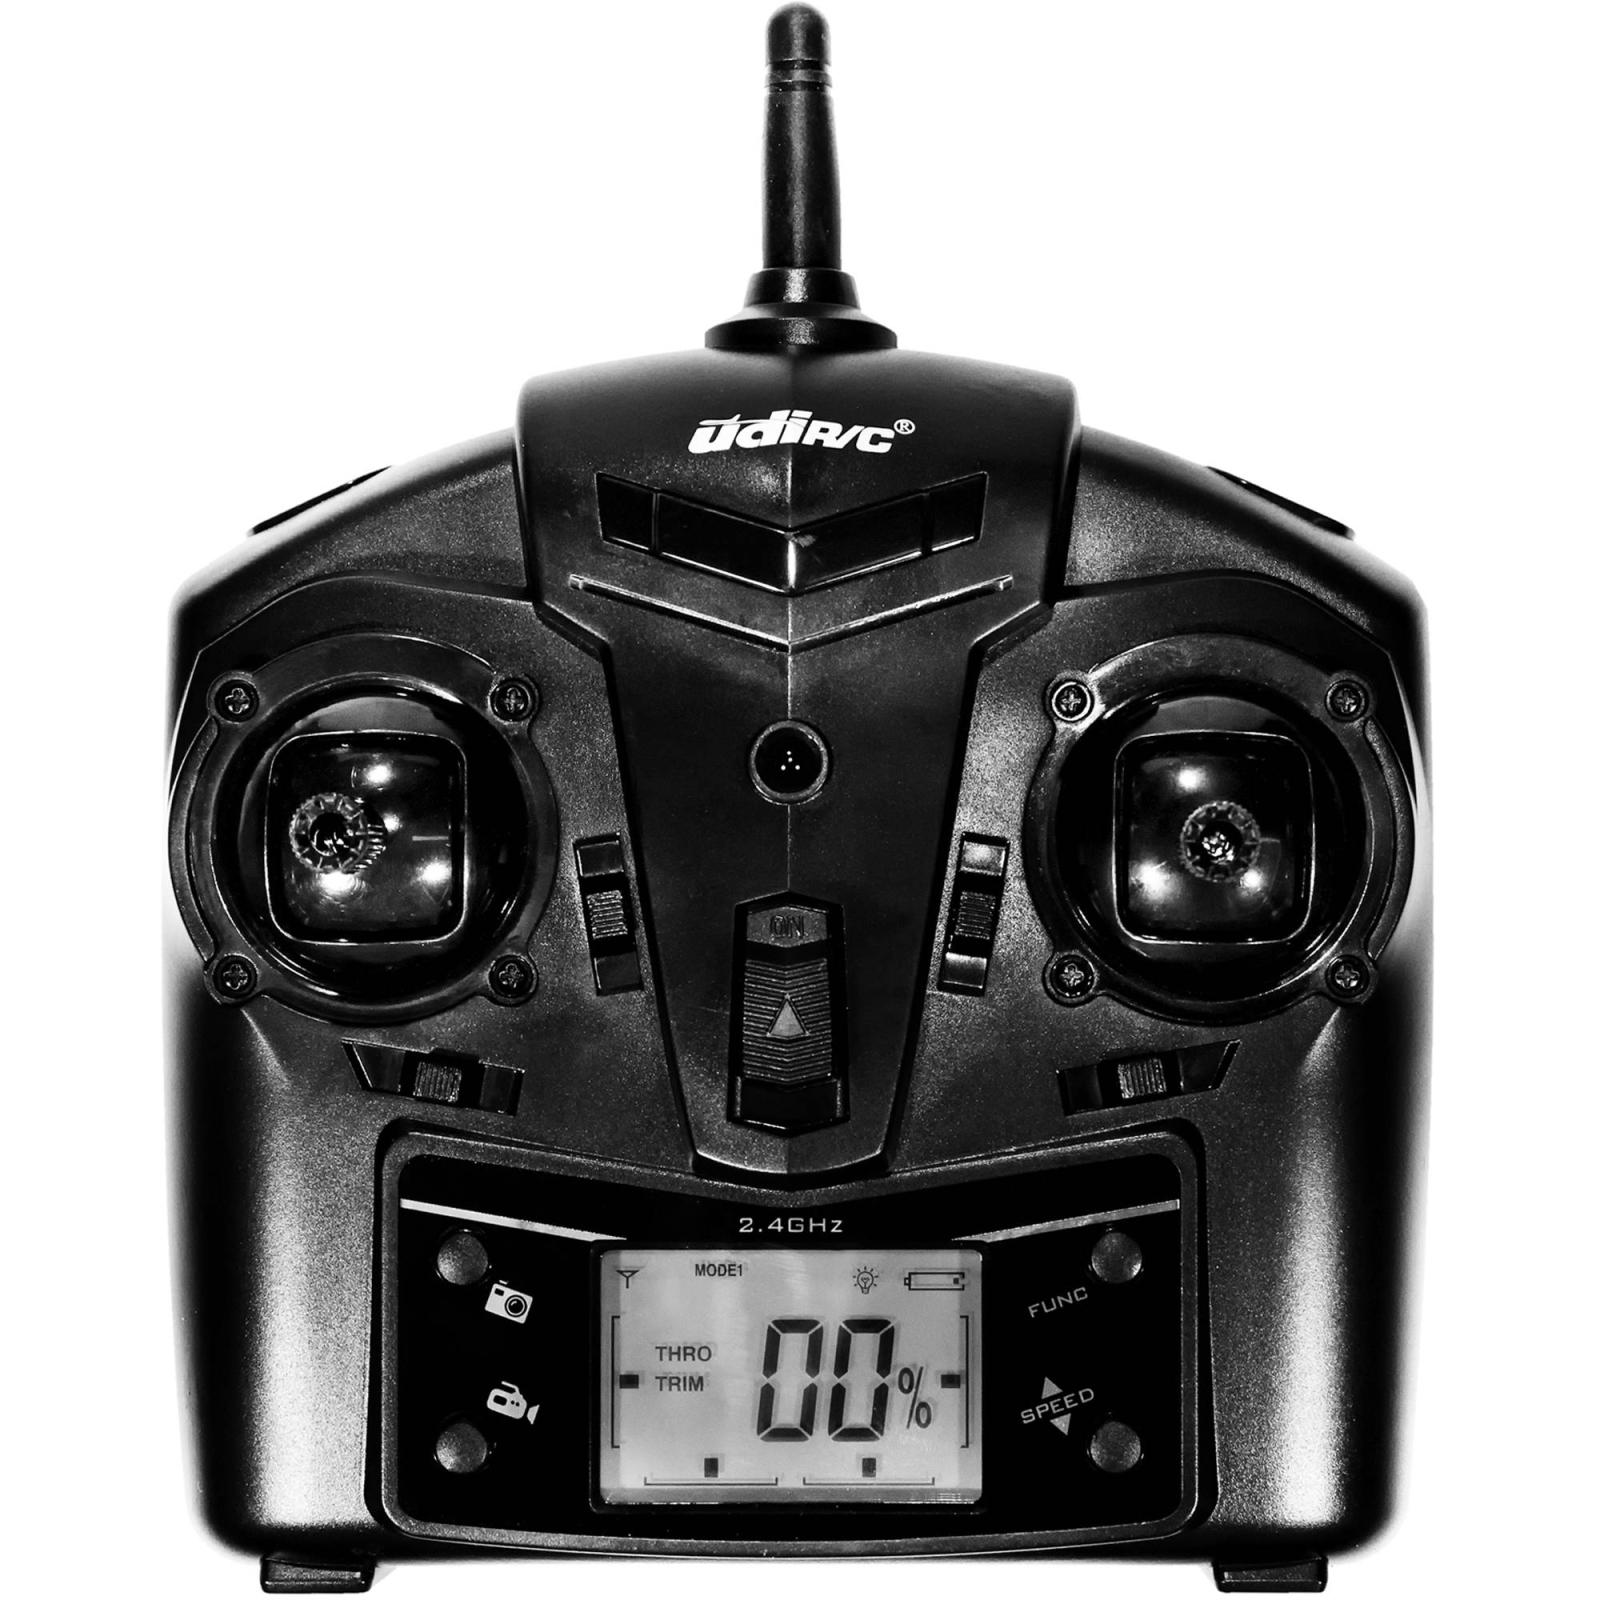 Квадрокоптер UDIRC Discovery U818A-1 2.4 GHz RTF Темно-синий (U818A-1) изображение 3